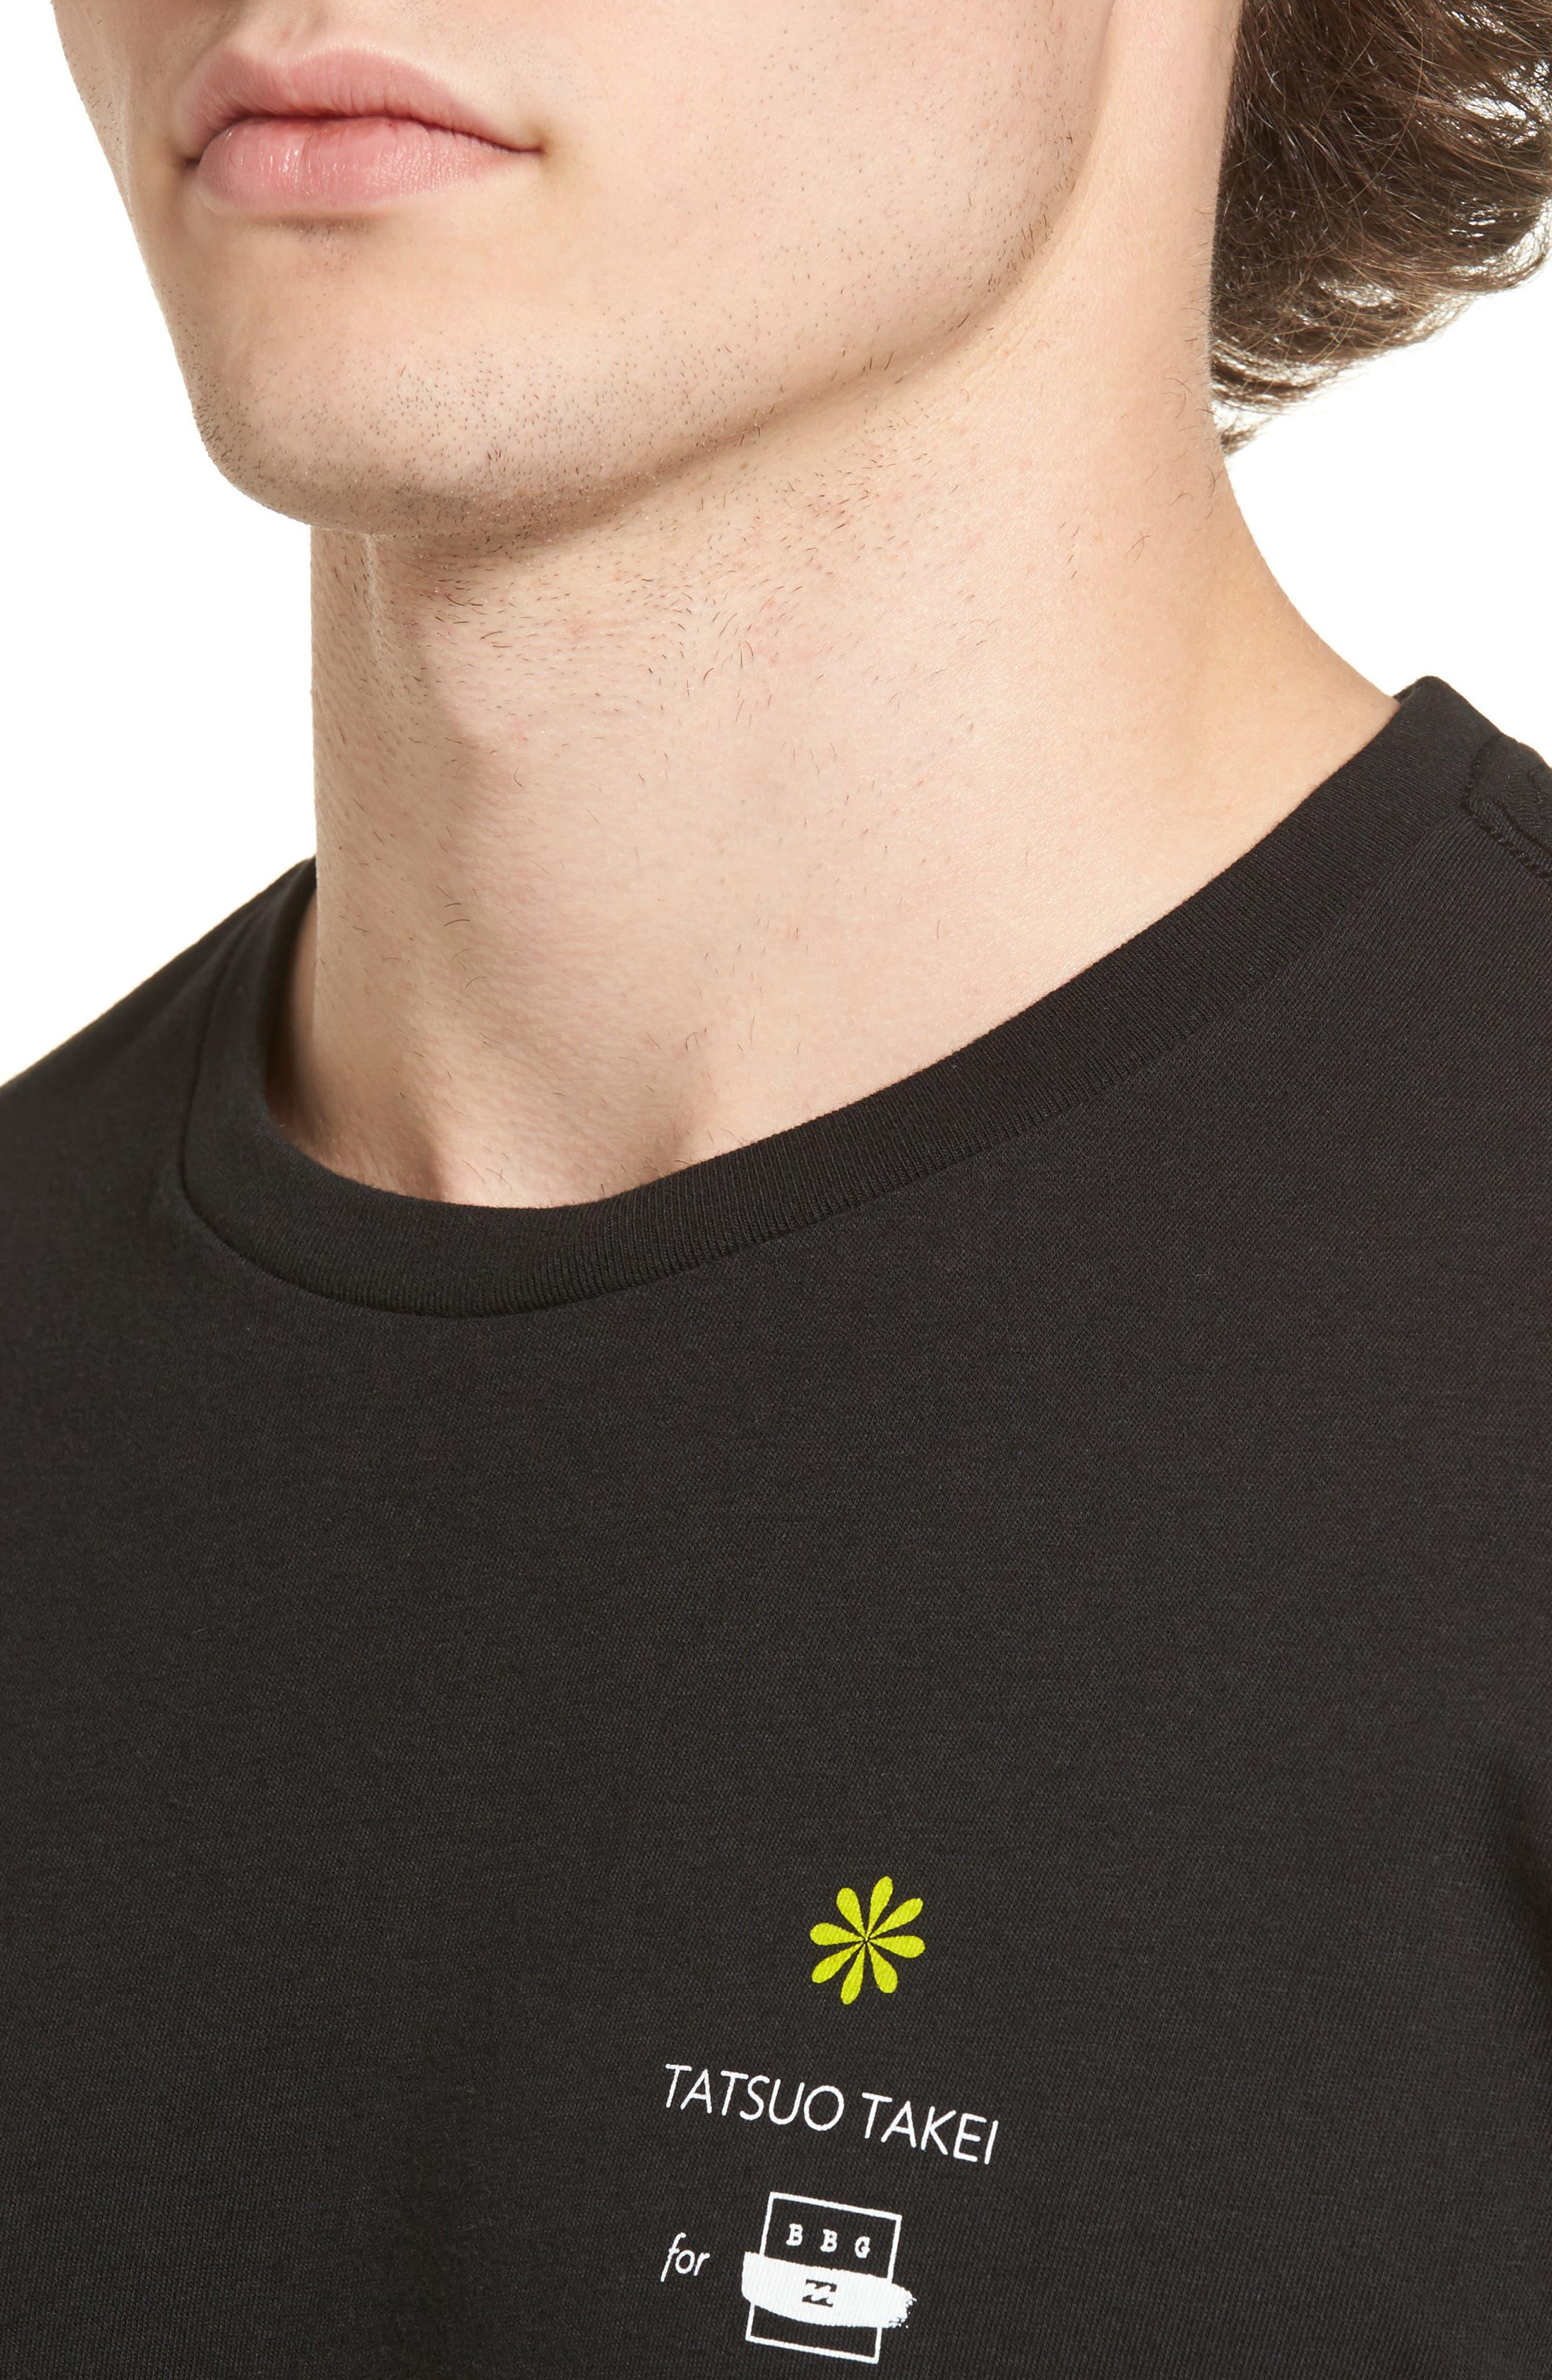 Offshore T-Shirt,                             Alternate thumbnail 4, color,                             Black